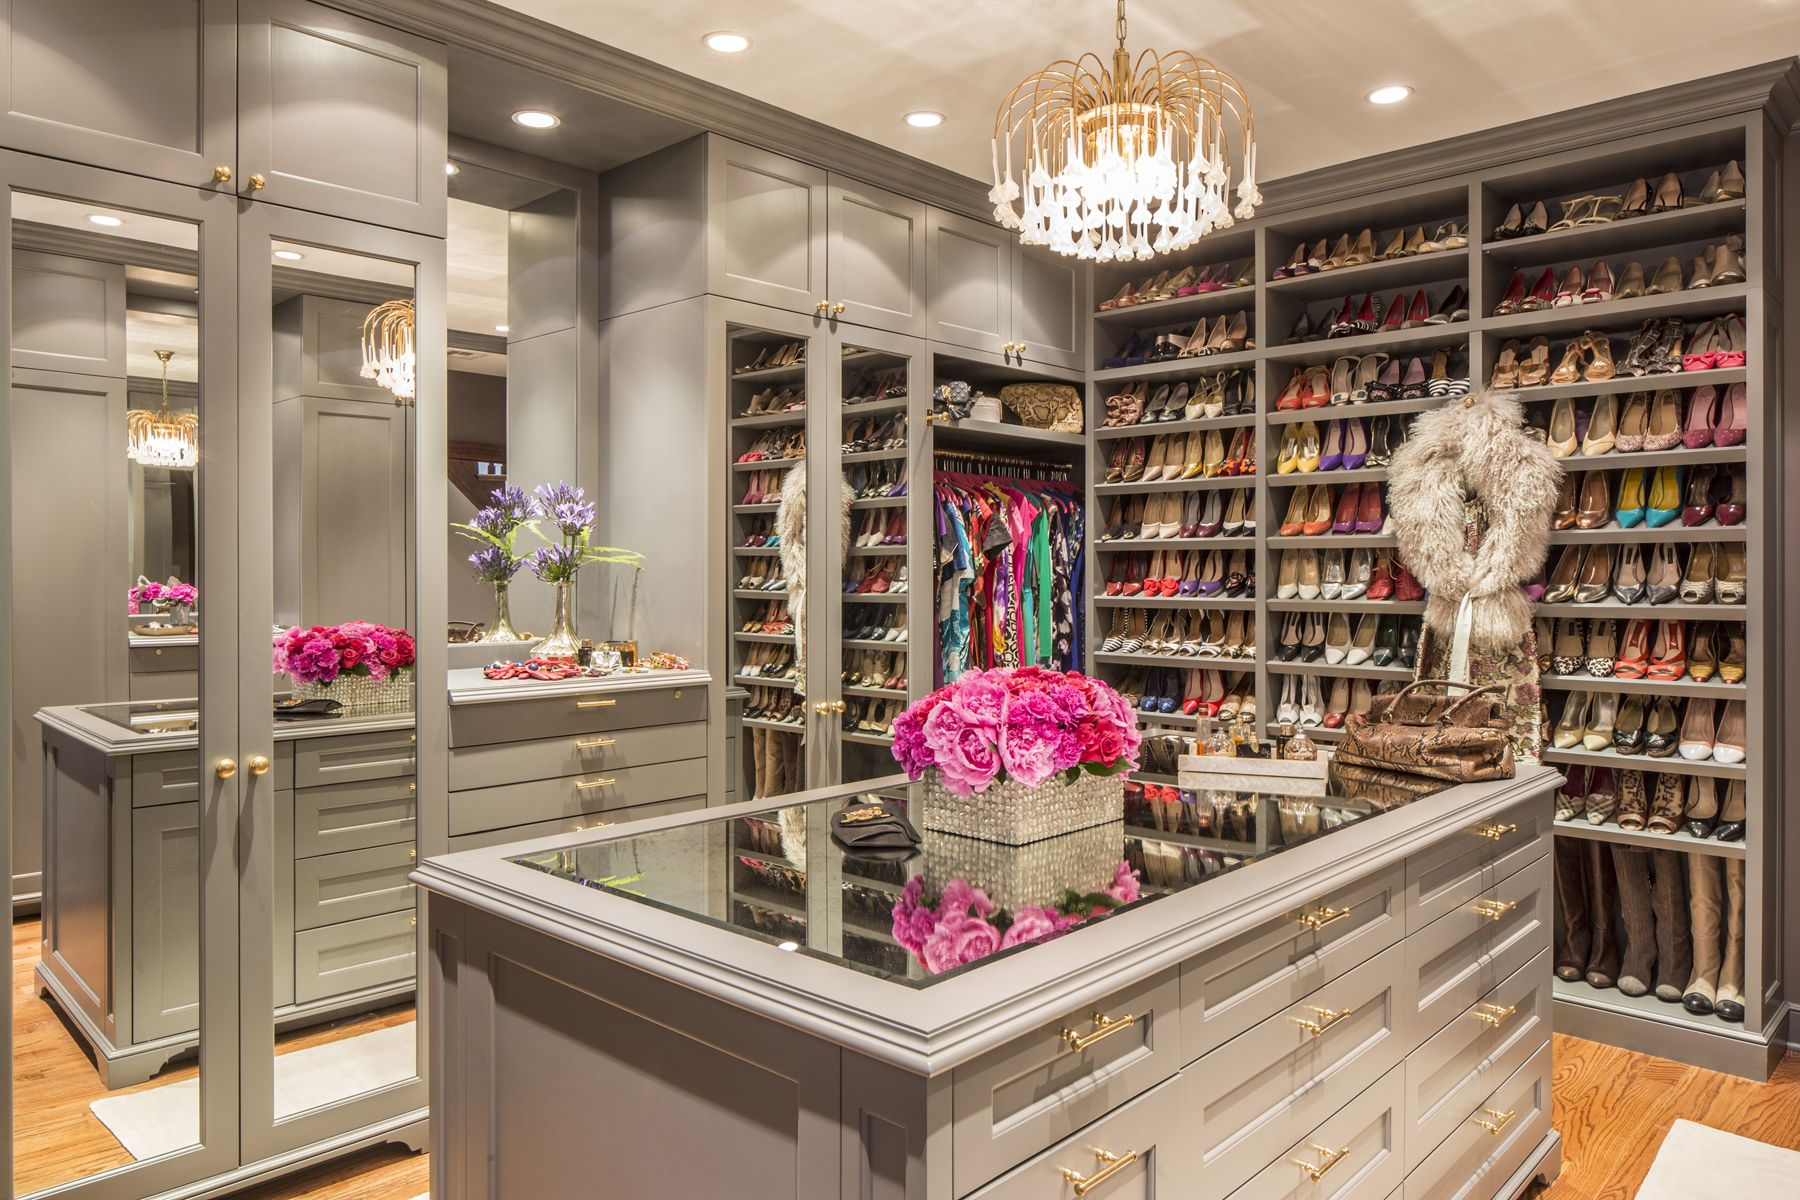 20 great walk in closet ideas stunning large custom closet designs rh elledecor com  most luxurious walk in closet